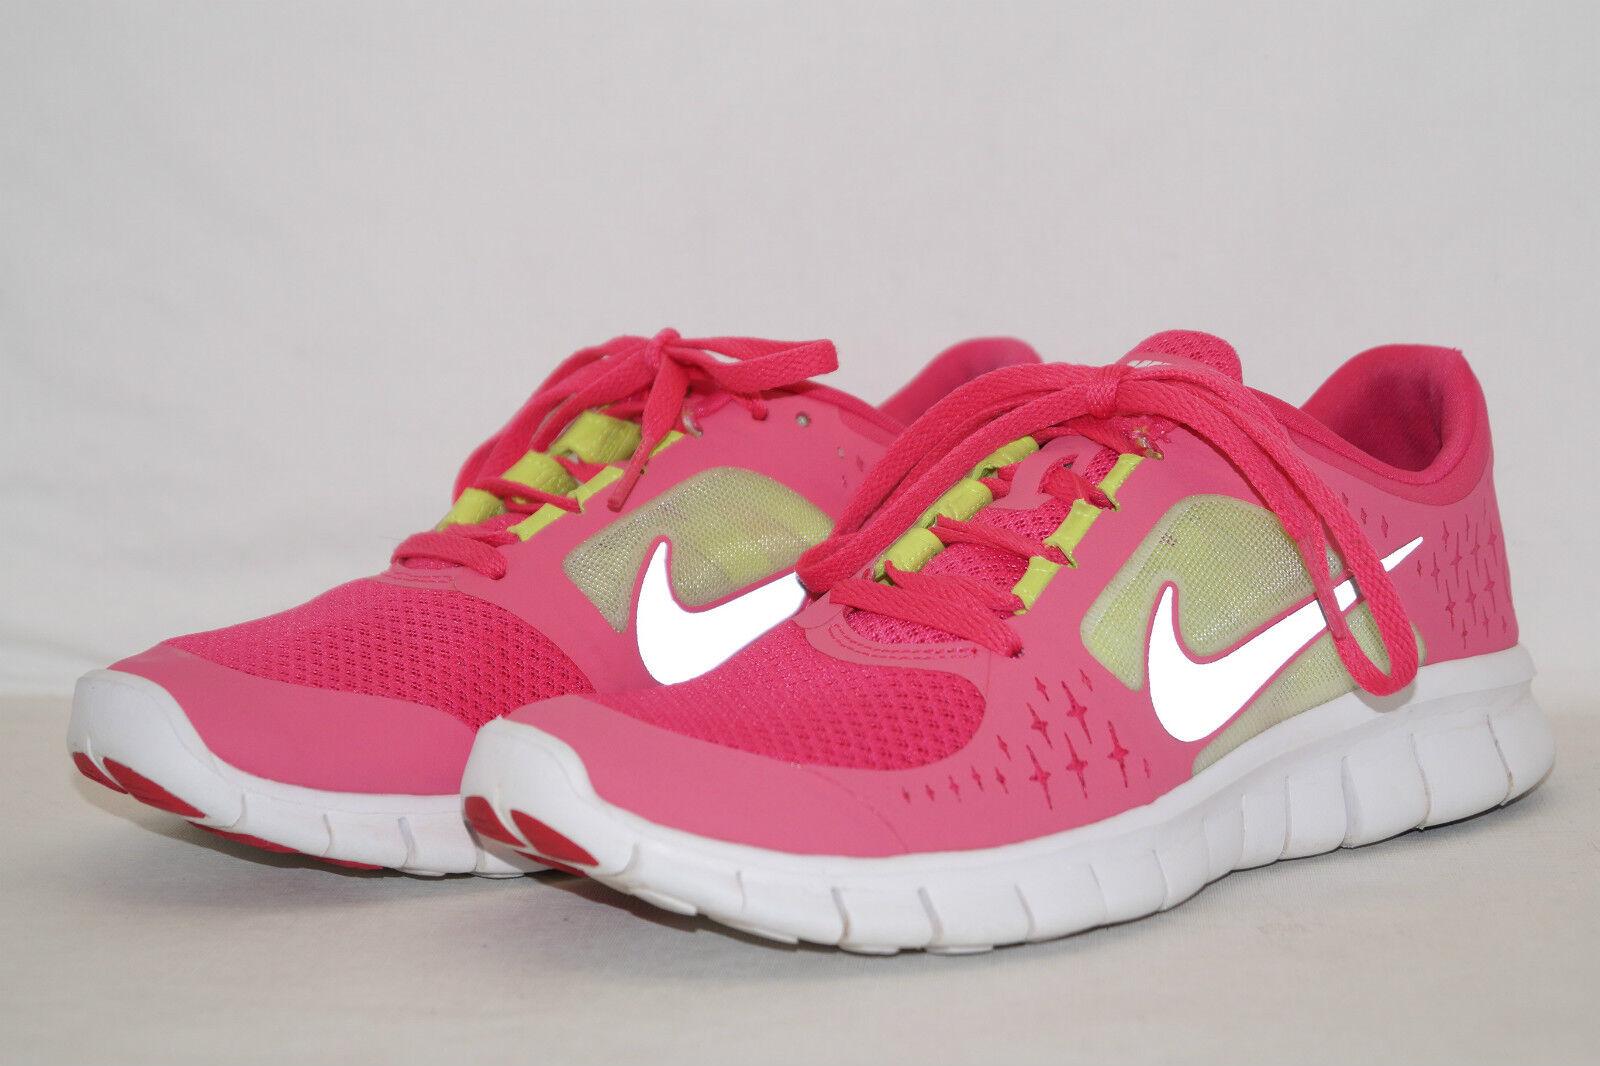 NIKE FREE RUN 3 pink yellow reflektierend Gr 38 pink 512098-600